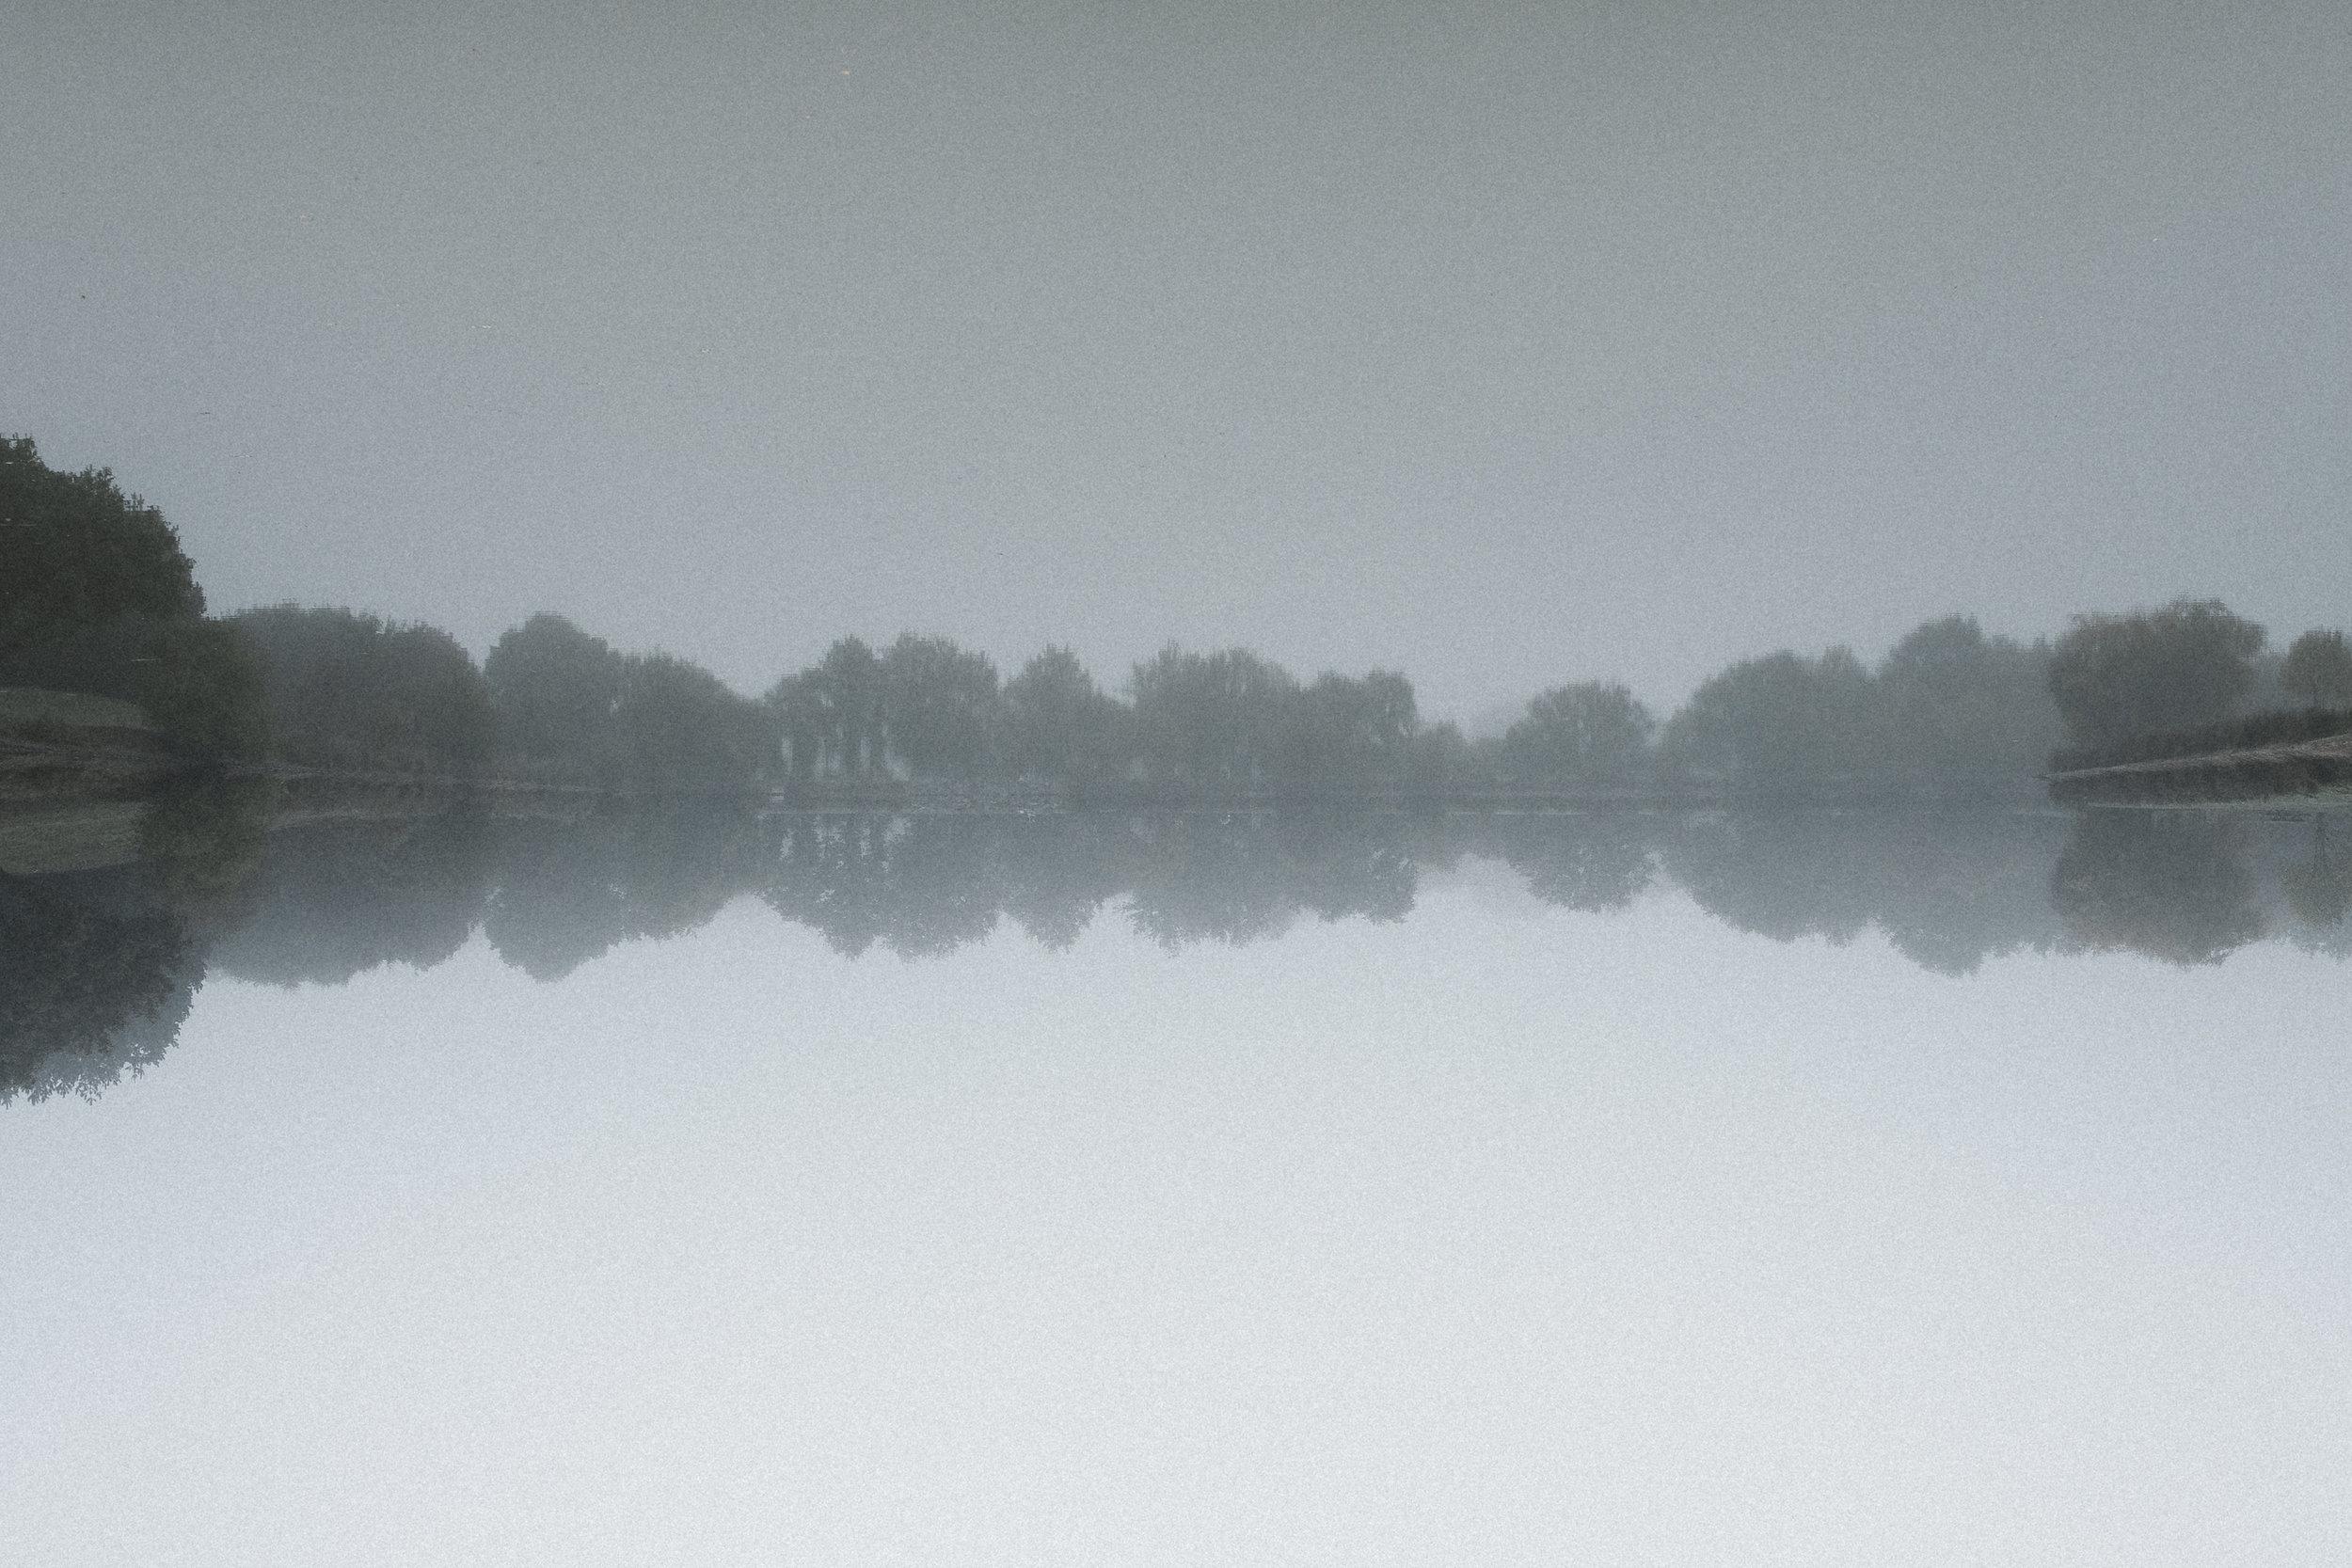 foggy-4955.jpg